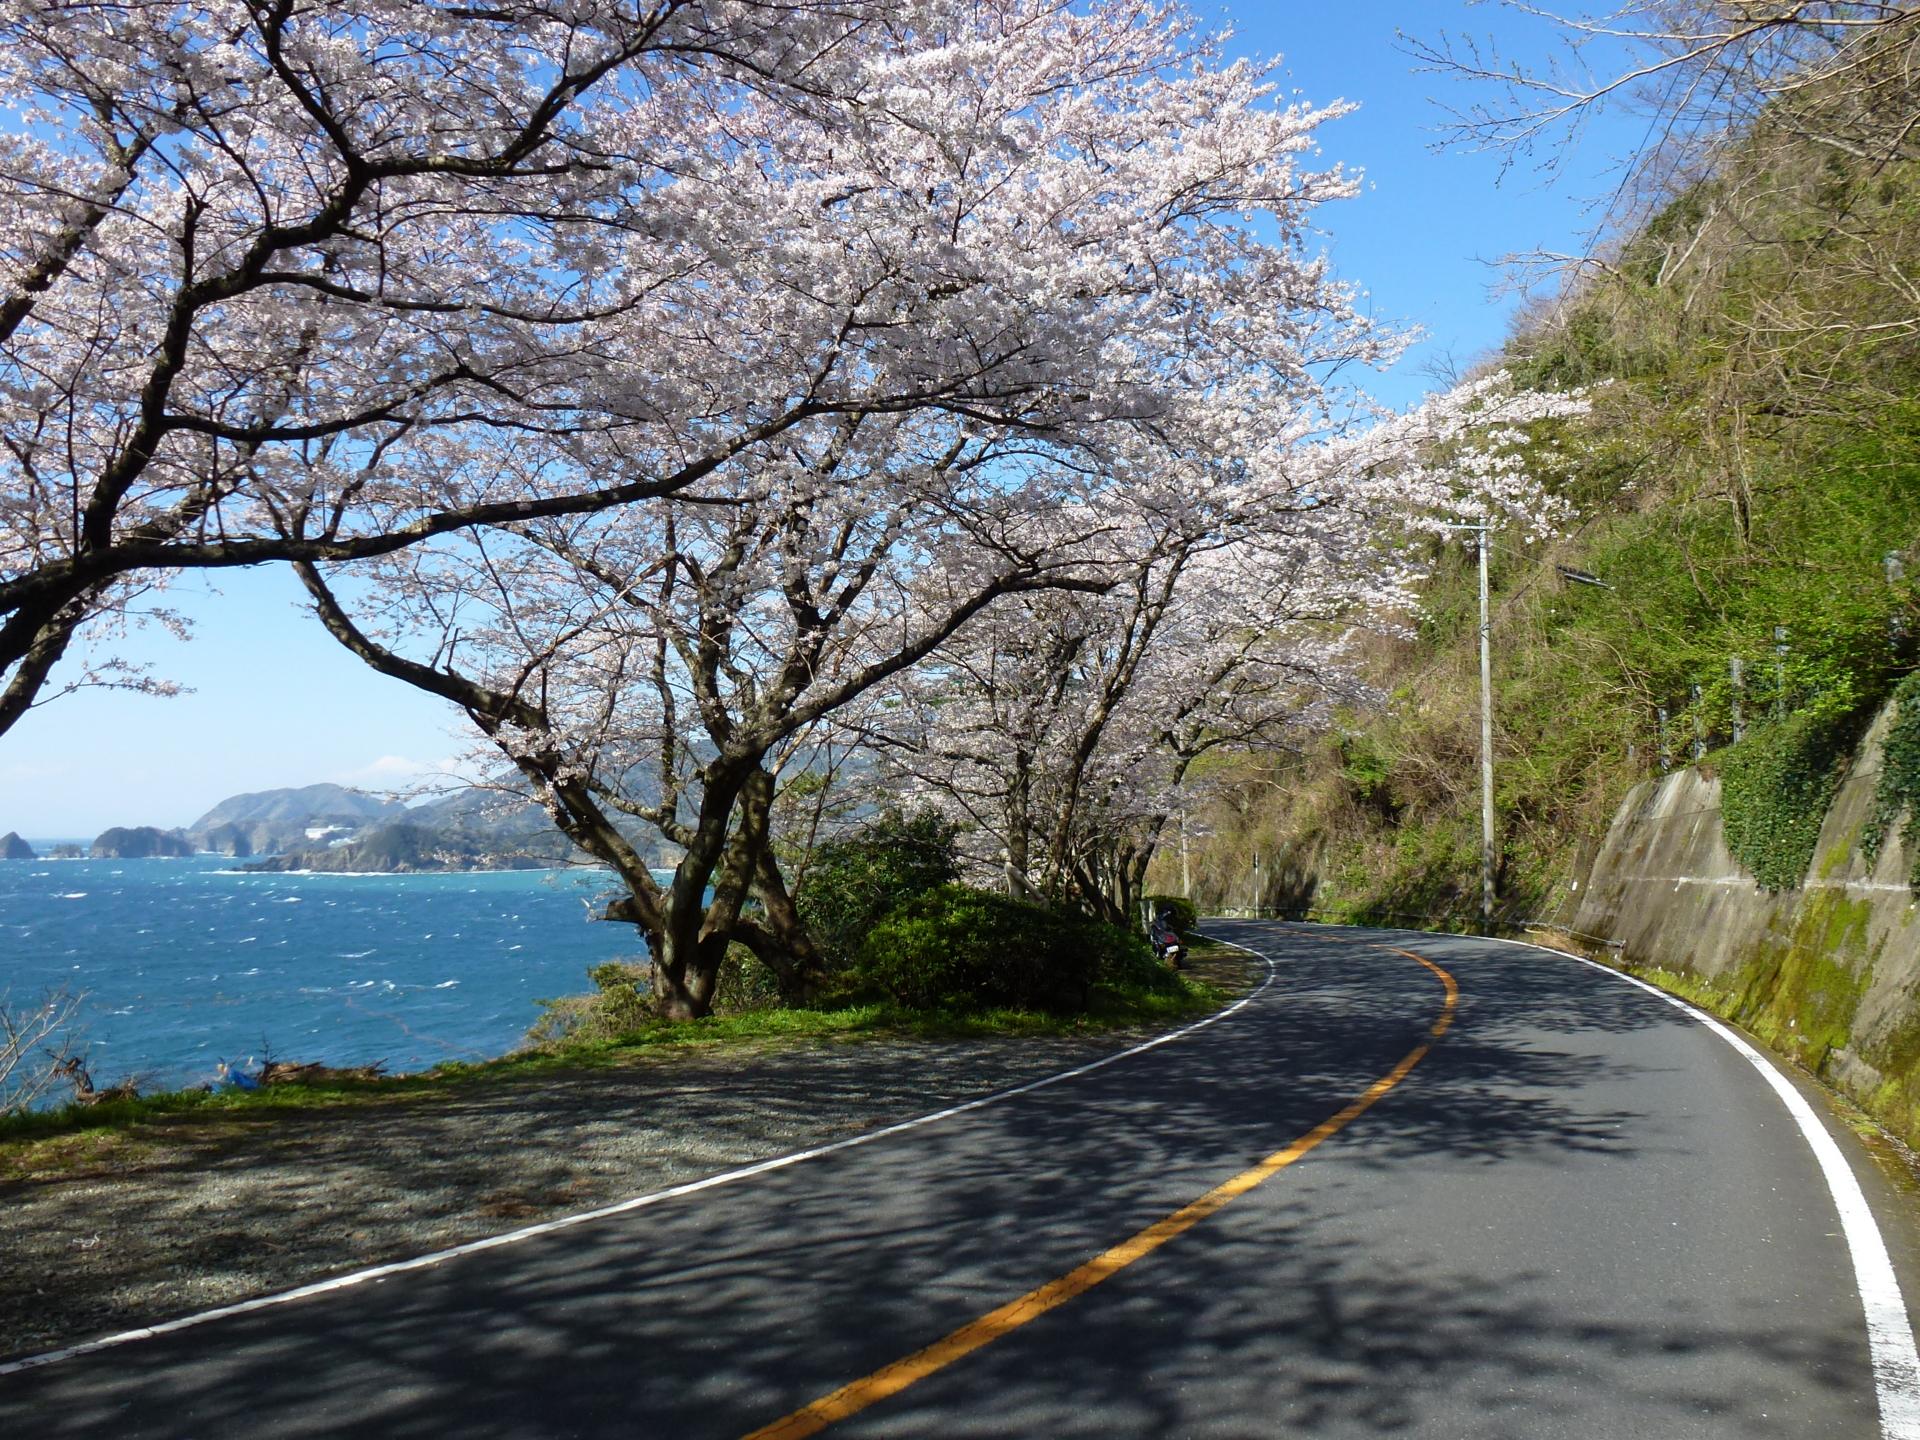 f:id:ToshUeno:20120401143501j:plain